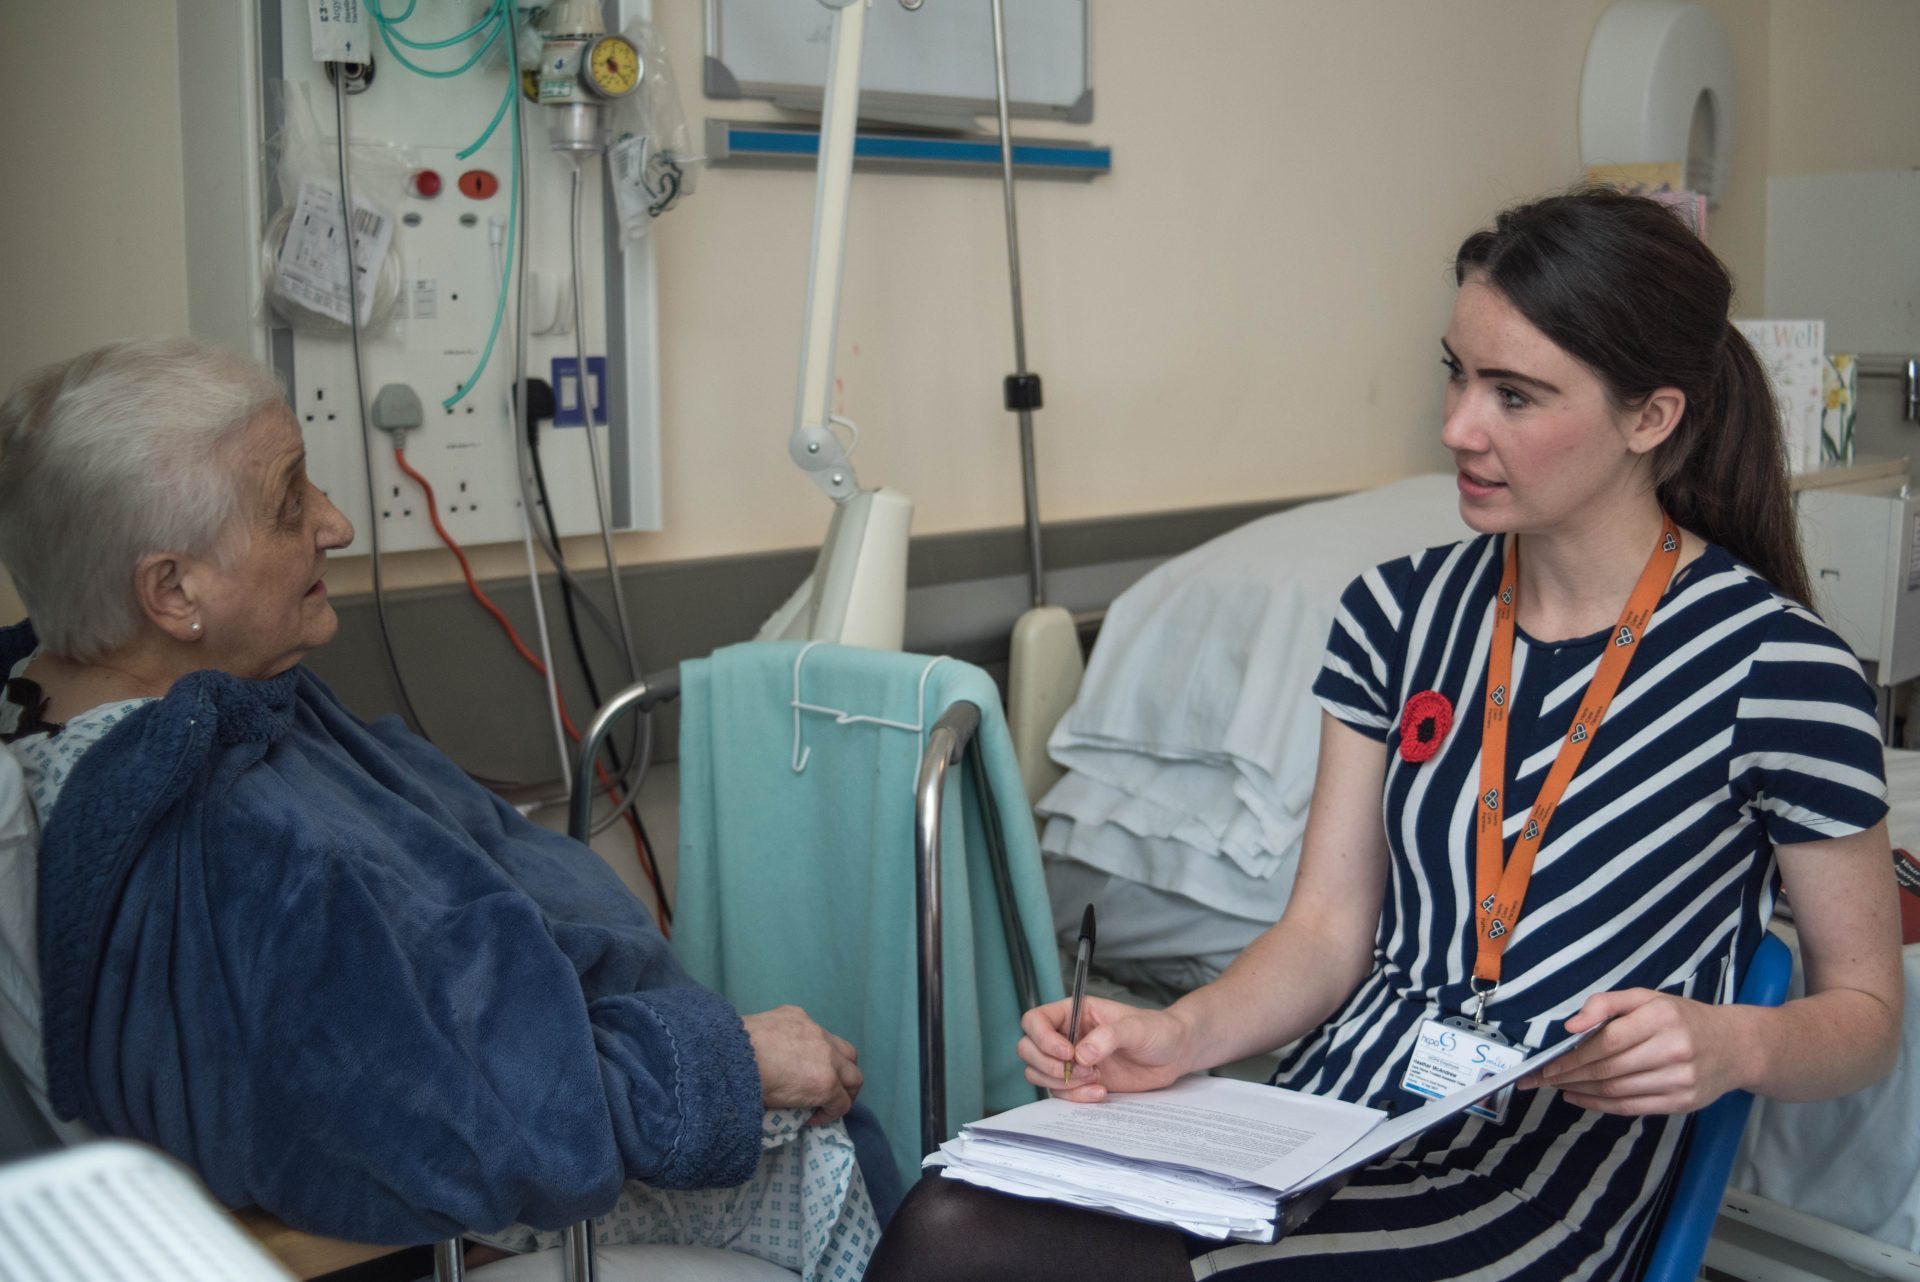 Care Nurse Assessor - Watford General Hospital or PAH Harlow